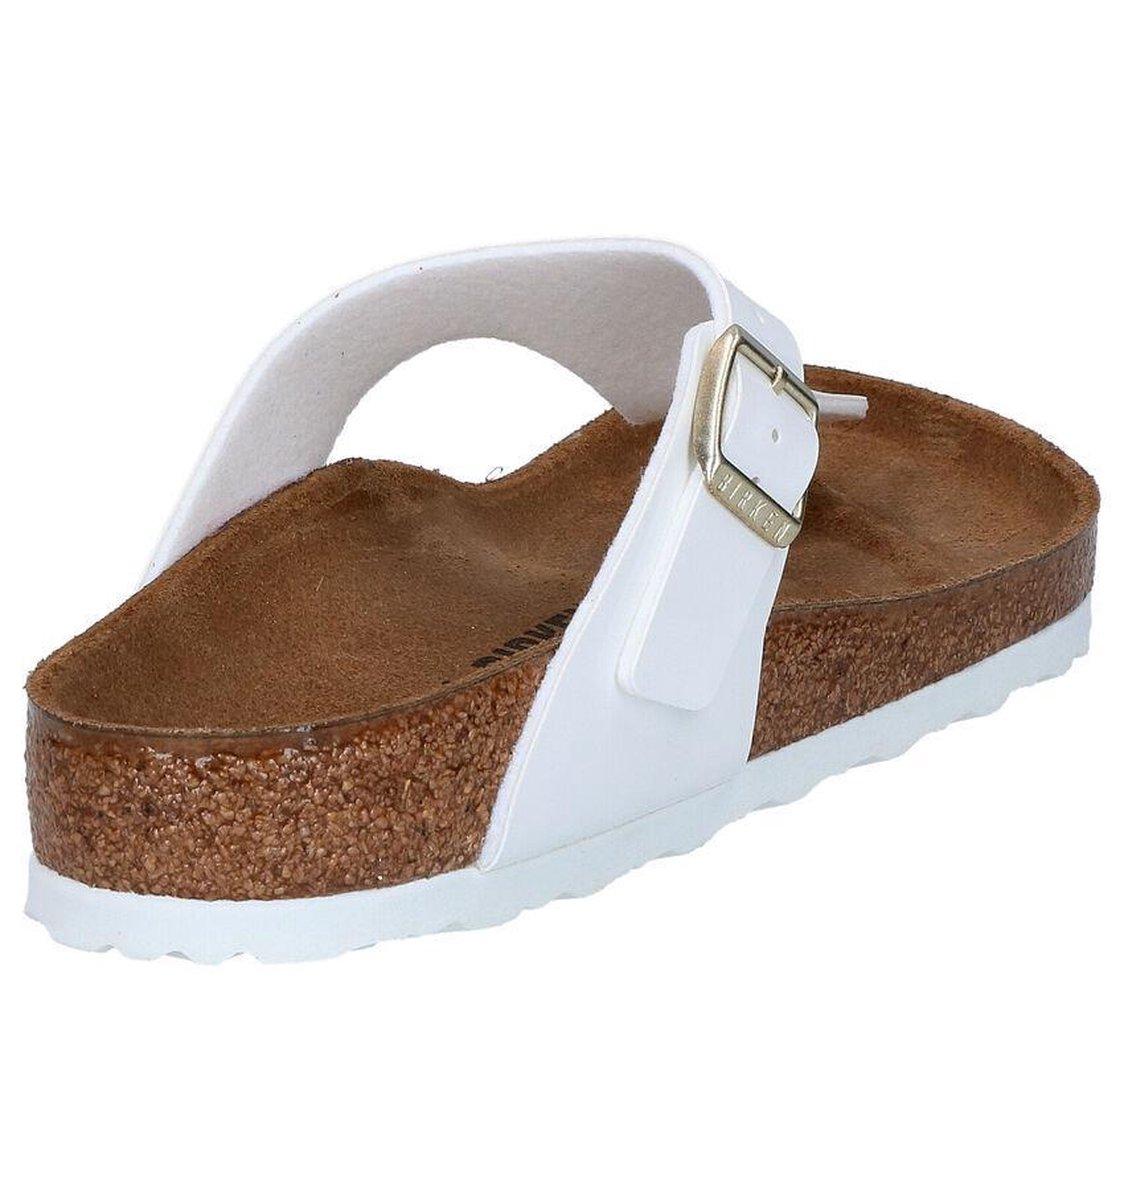 Birkenstock Gizeh Dames Slippers Wit Maat 43